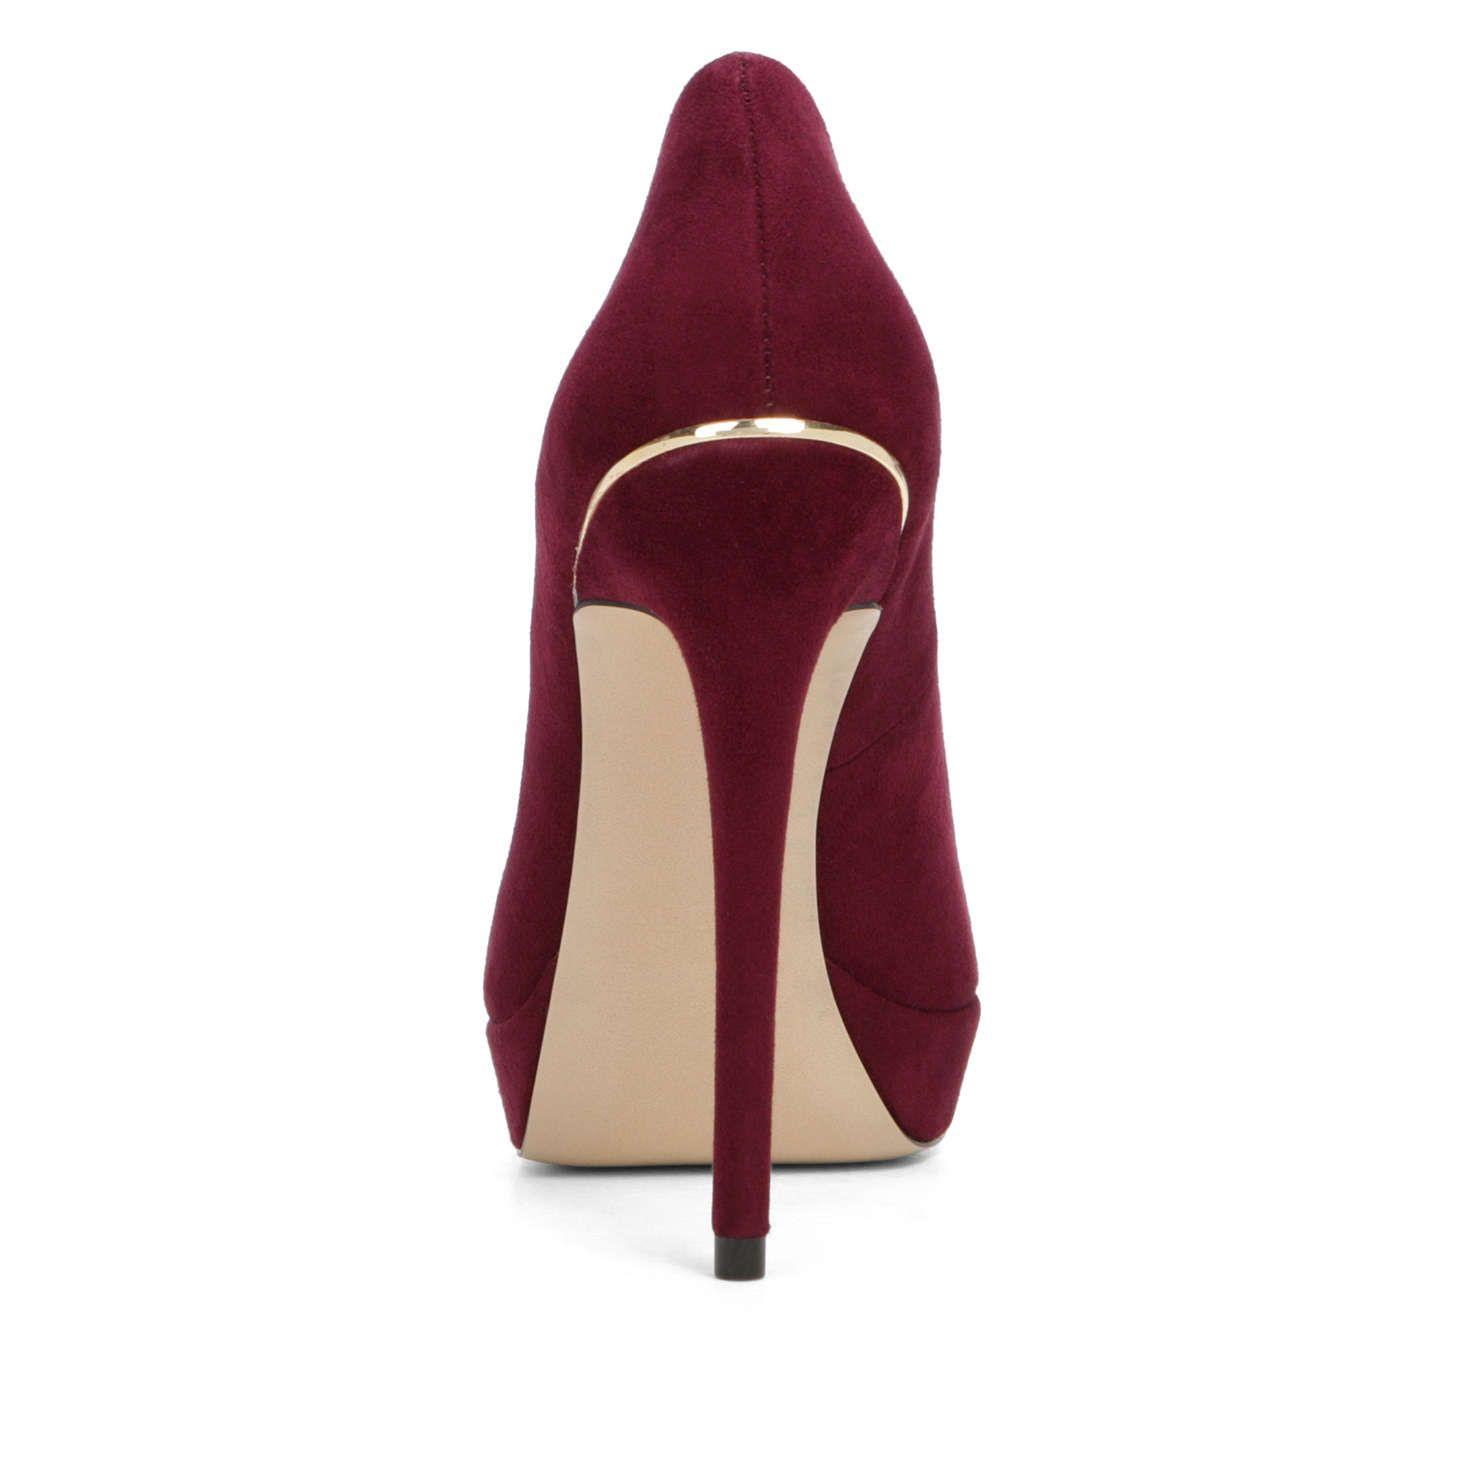 Zandina Womens Fashion Sexy Handmade High Heel Peep Toe Platform Multicoloured Stiletto Slide Bridal Pumps Shoes Darkred